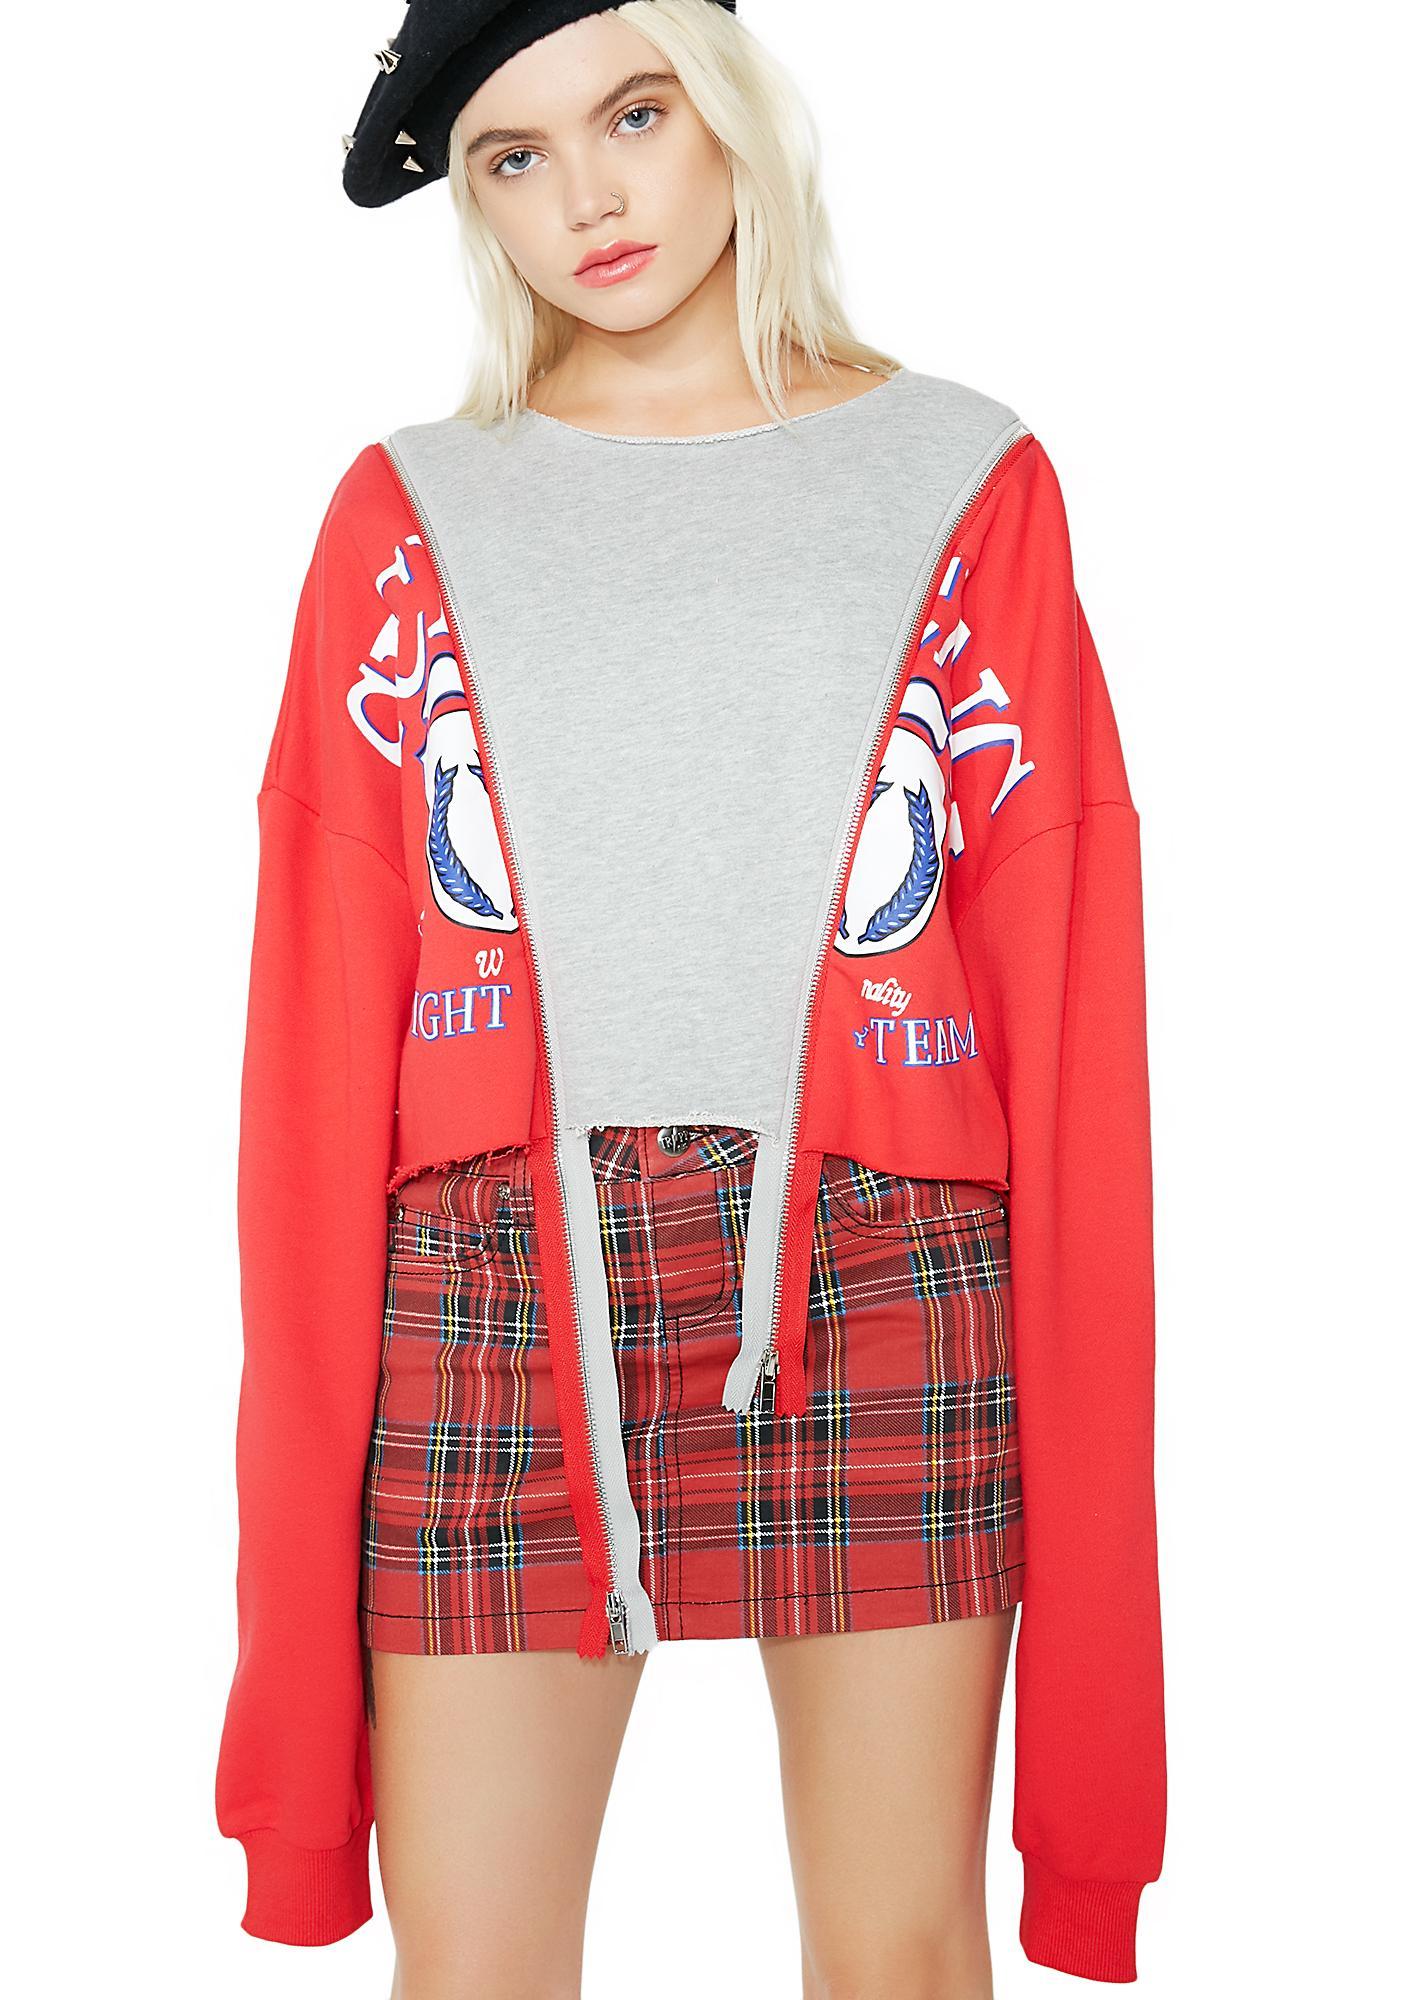 In The Mix Paneled Sweatshirt